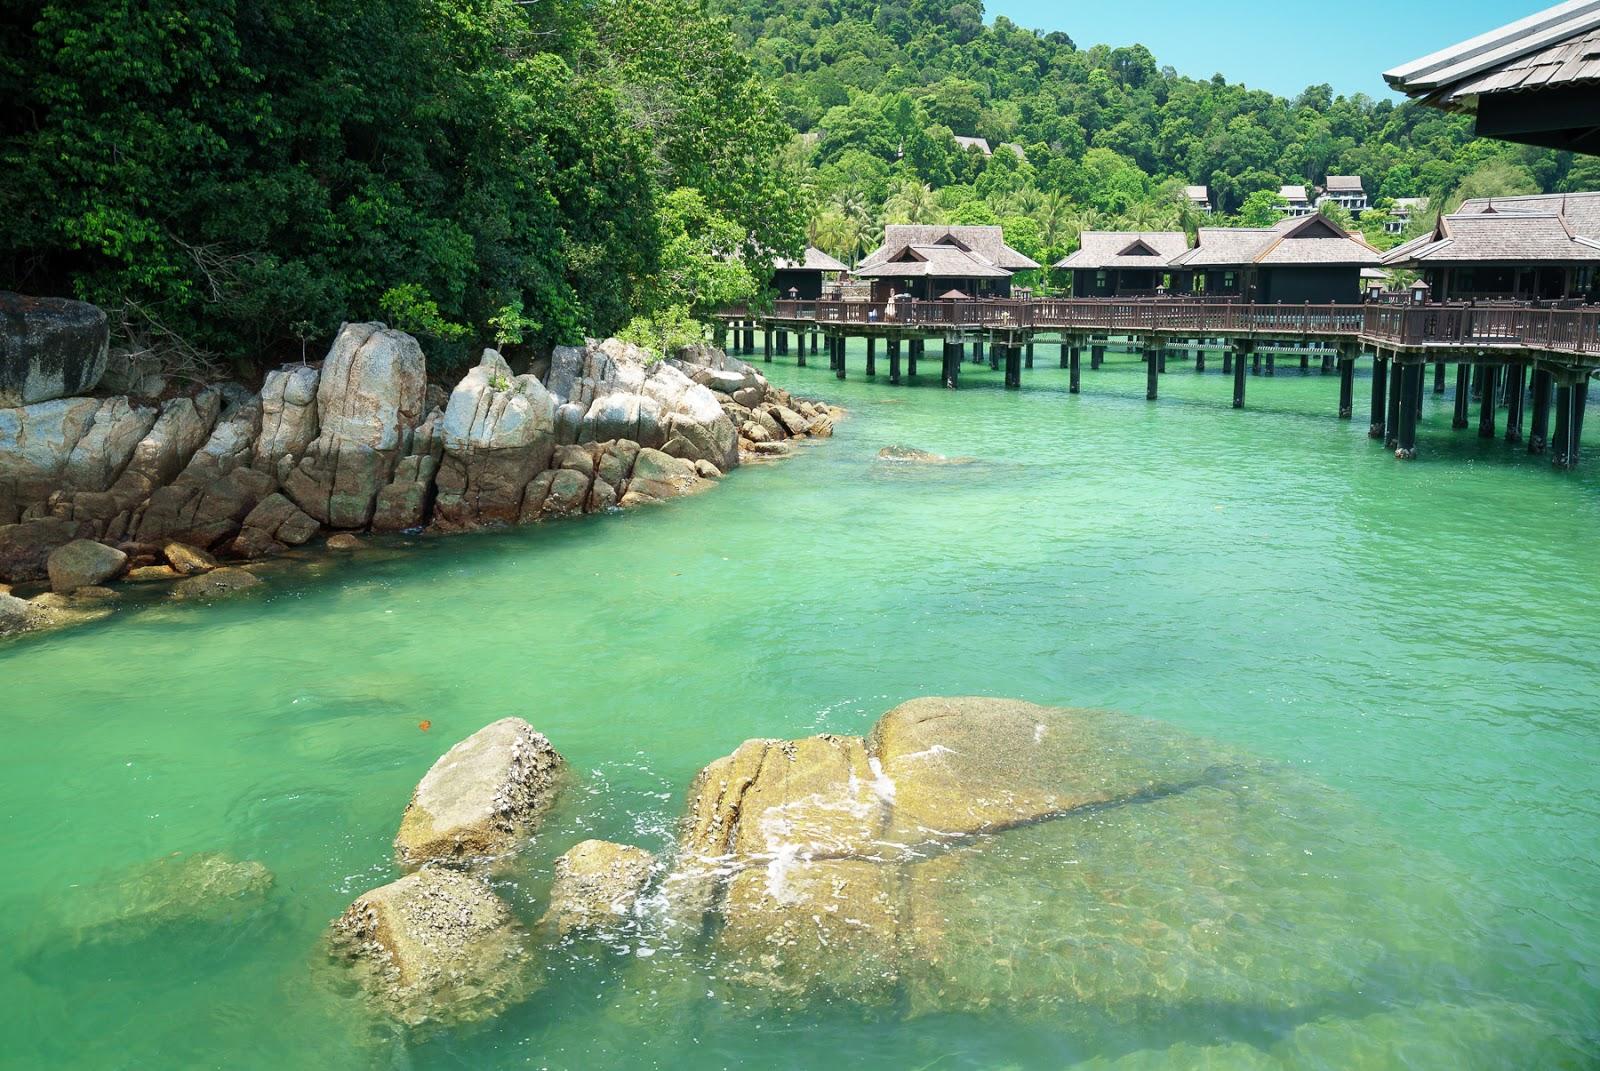 جزیره پانگکور لوت مالزی